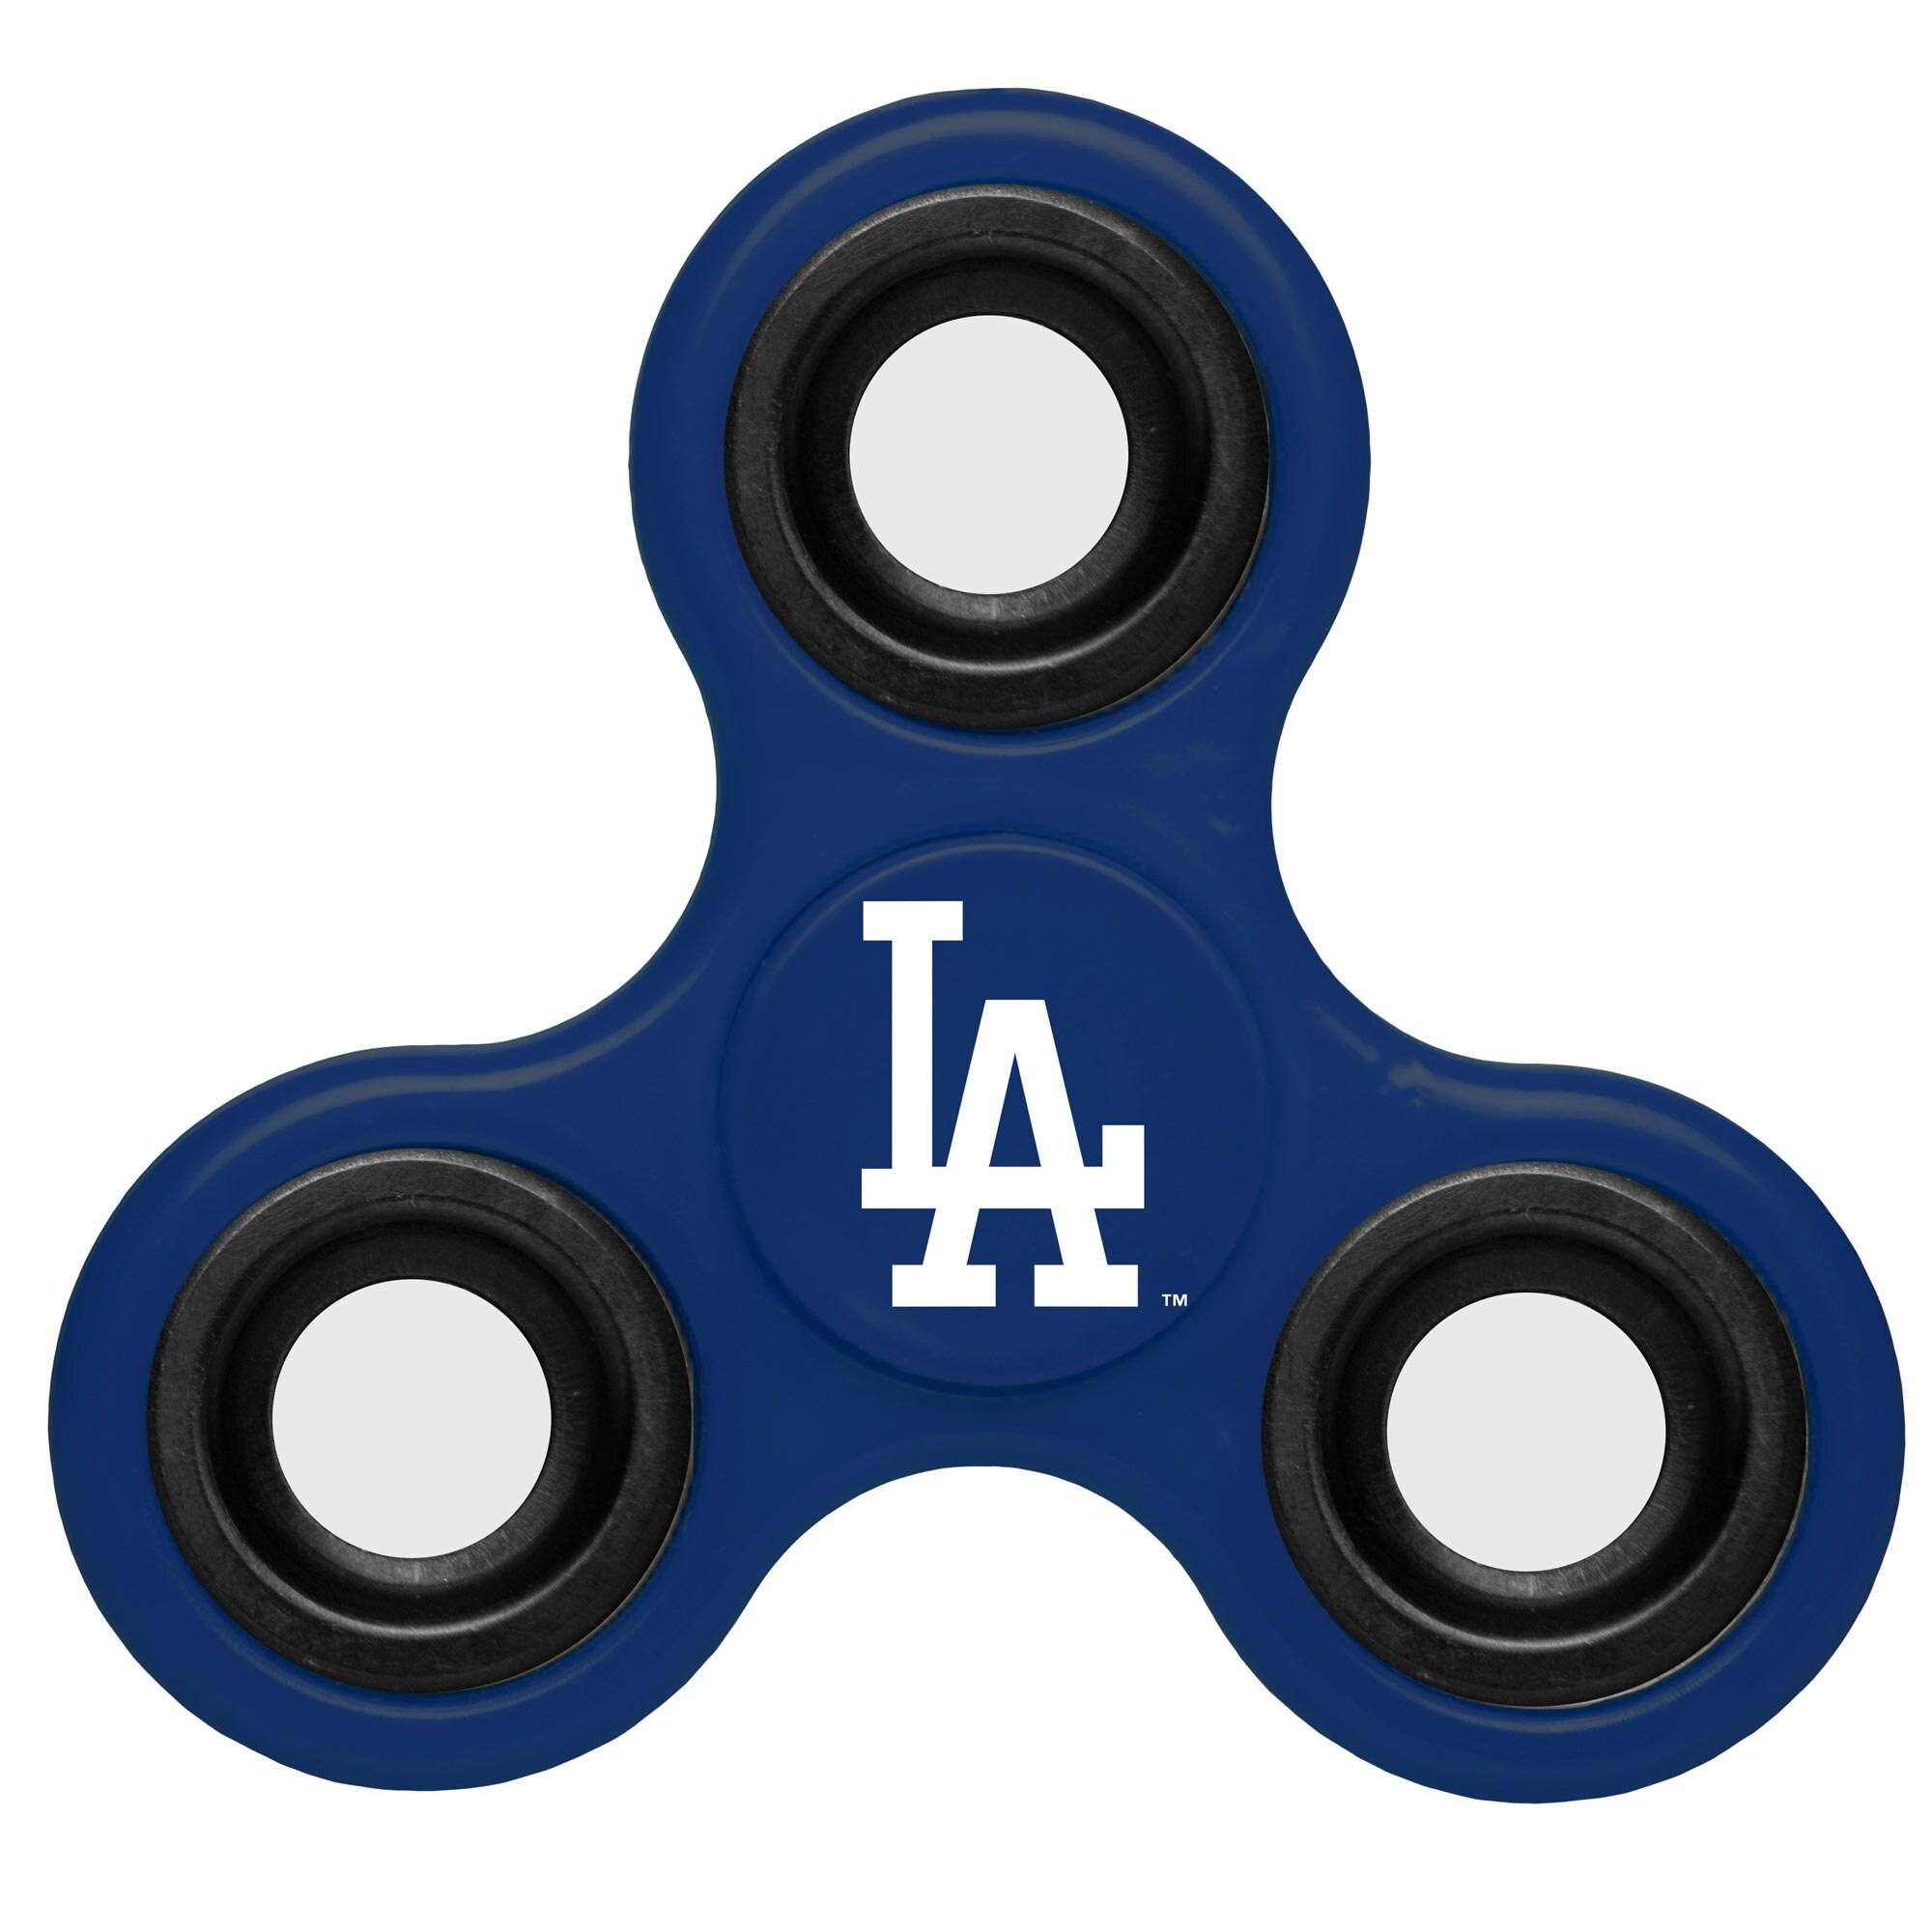 Los Angeles Dodgers 3-Way Fidget Spinner